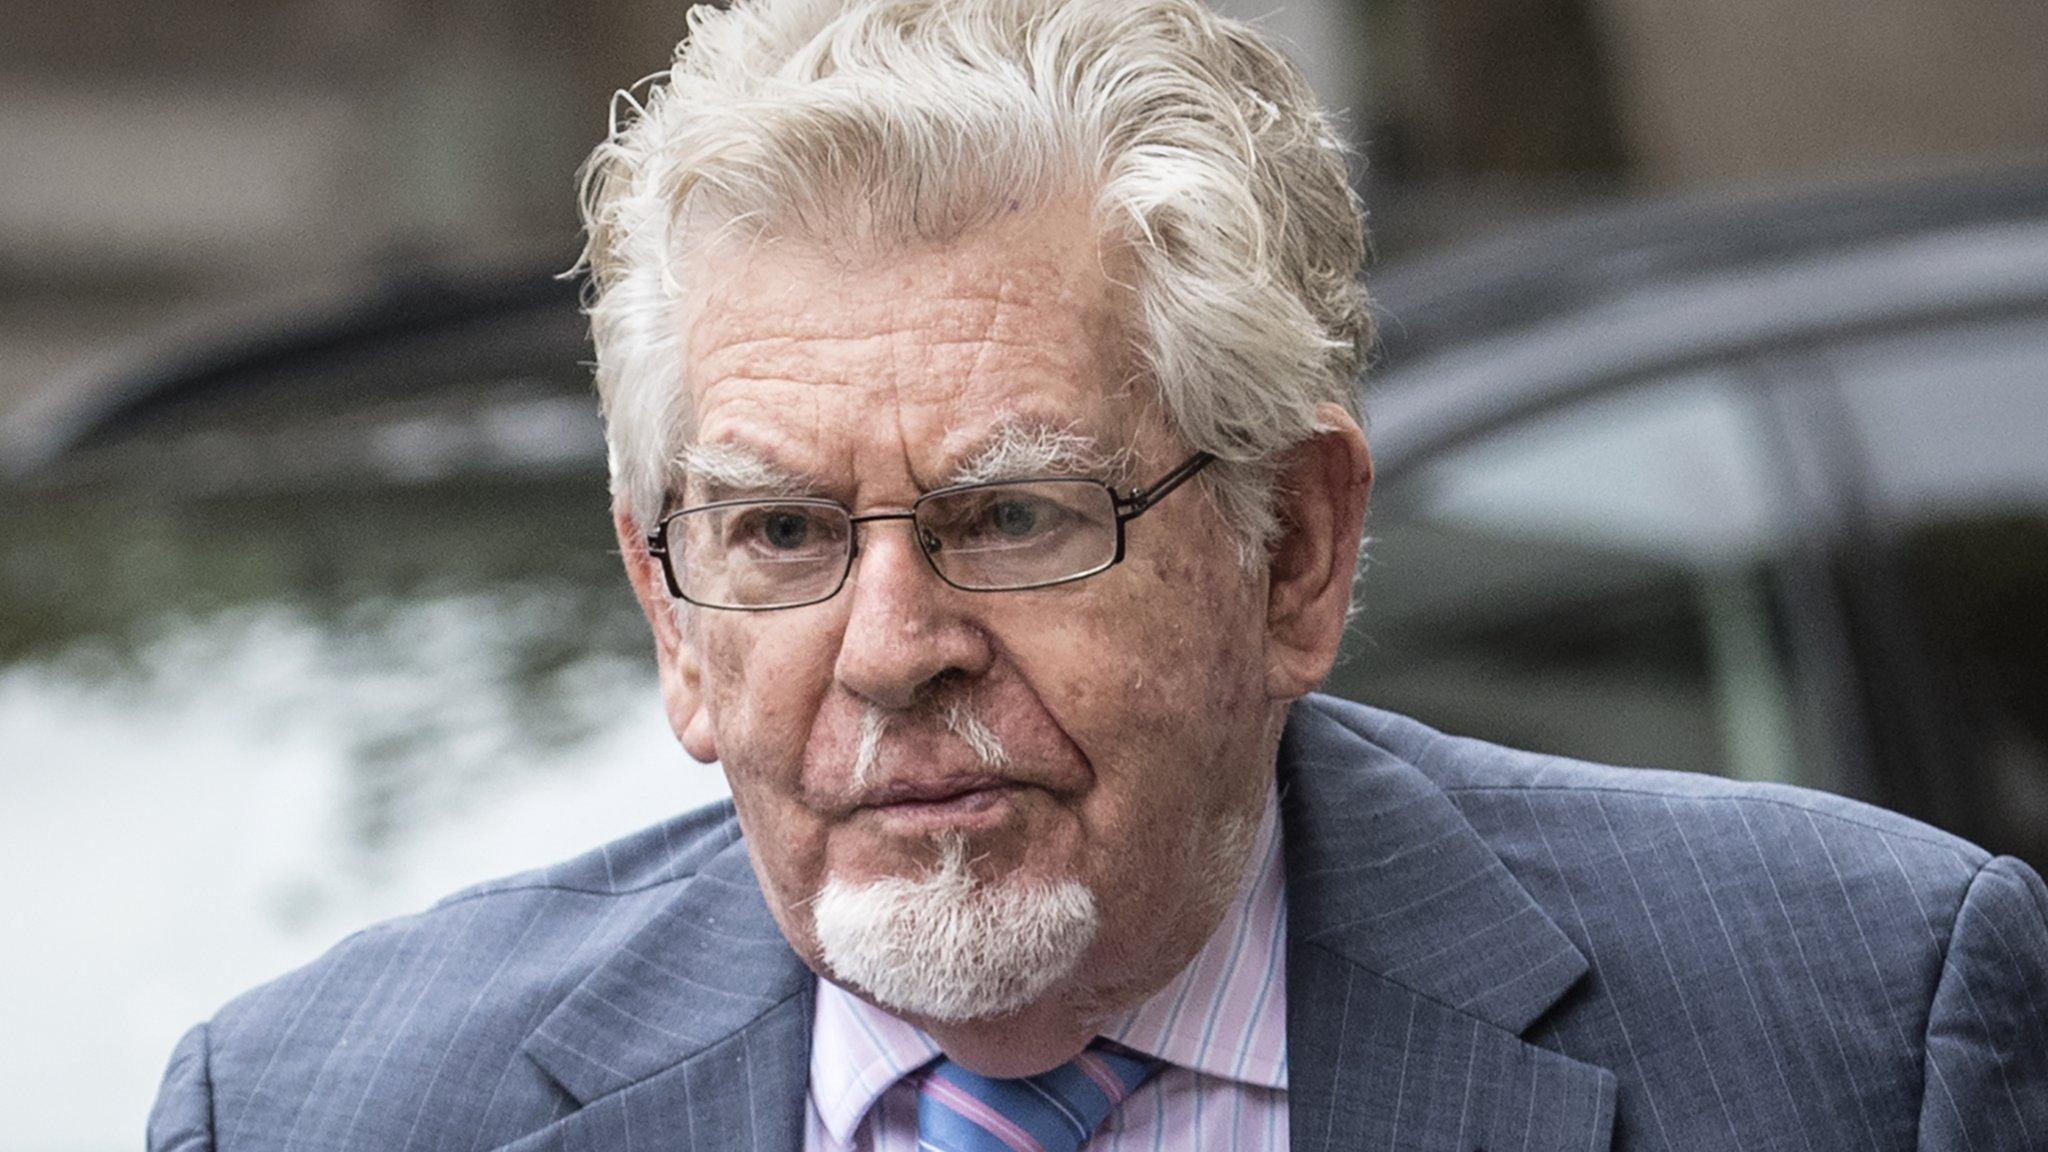 Harris indecent assault verdict overturned